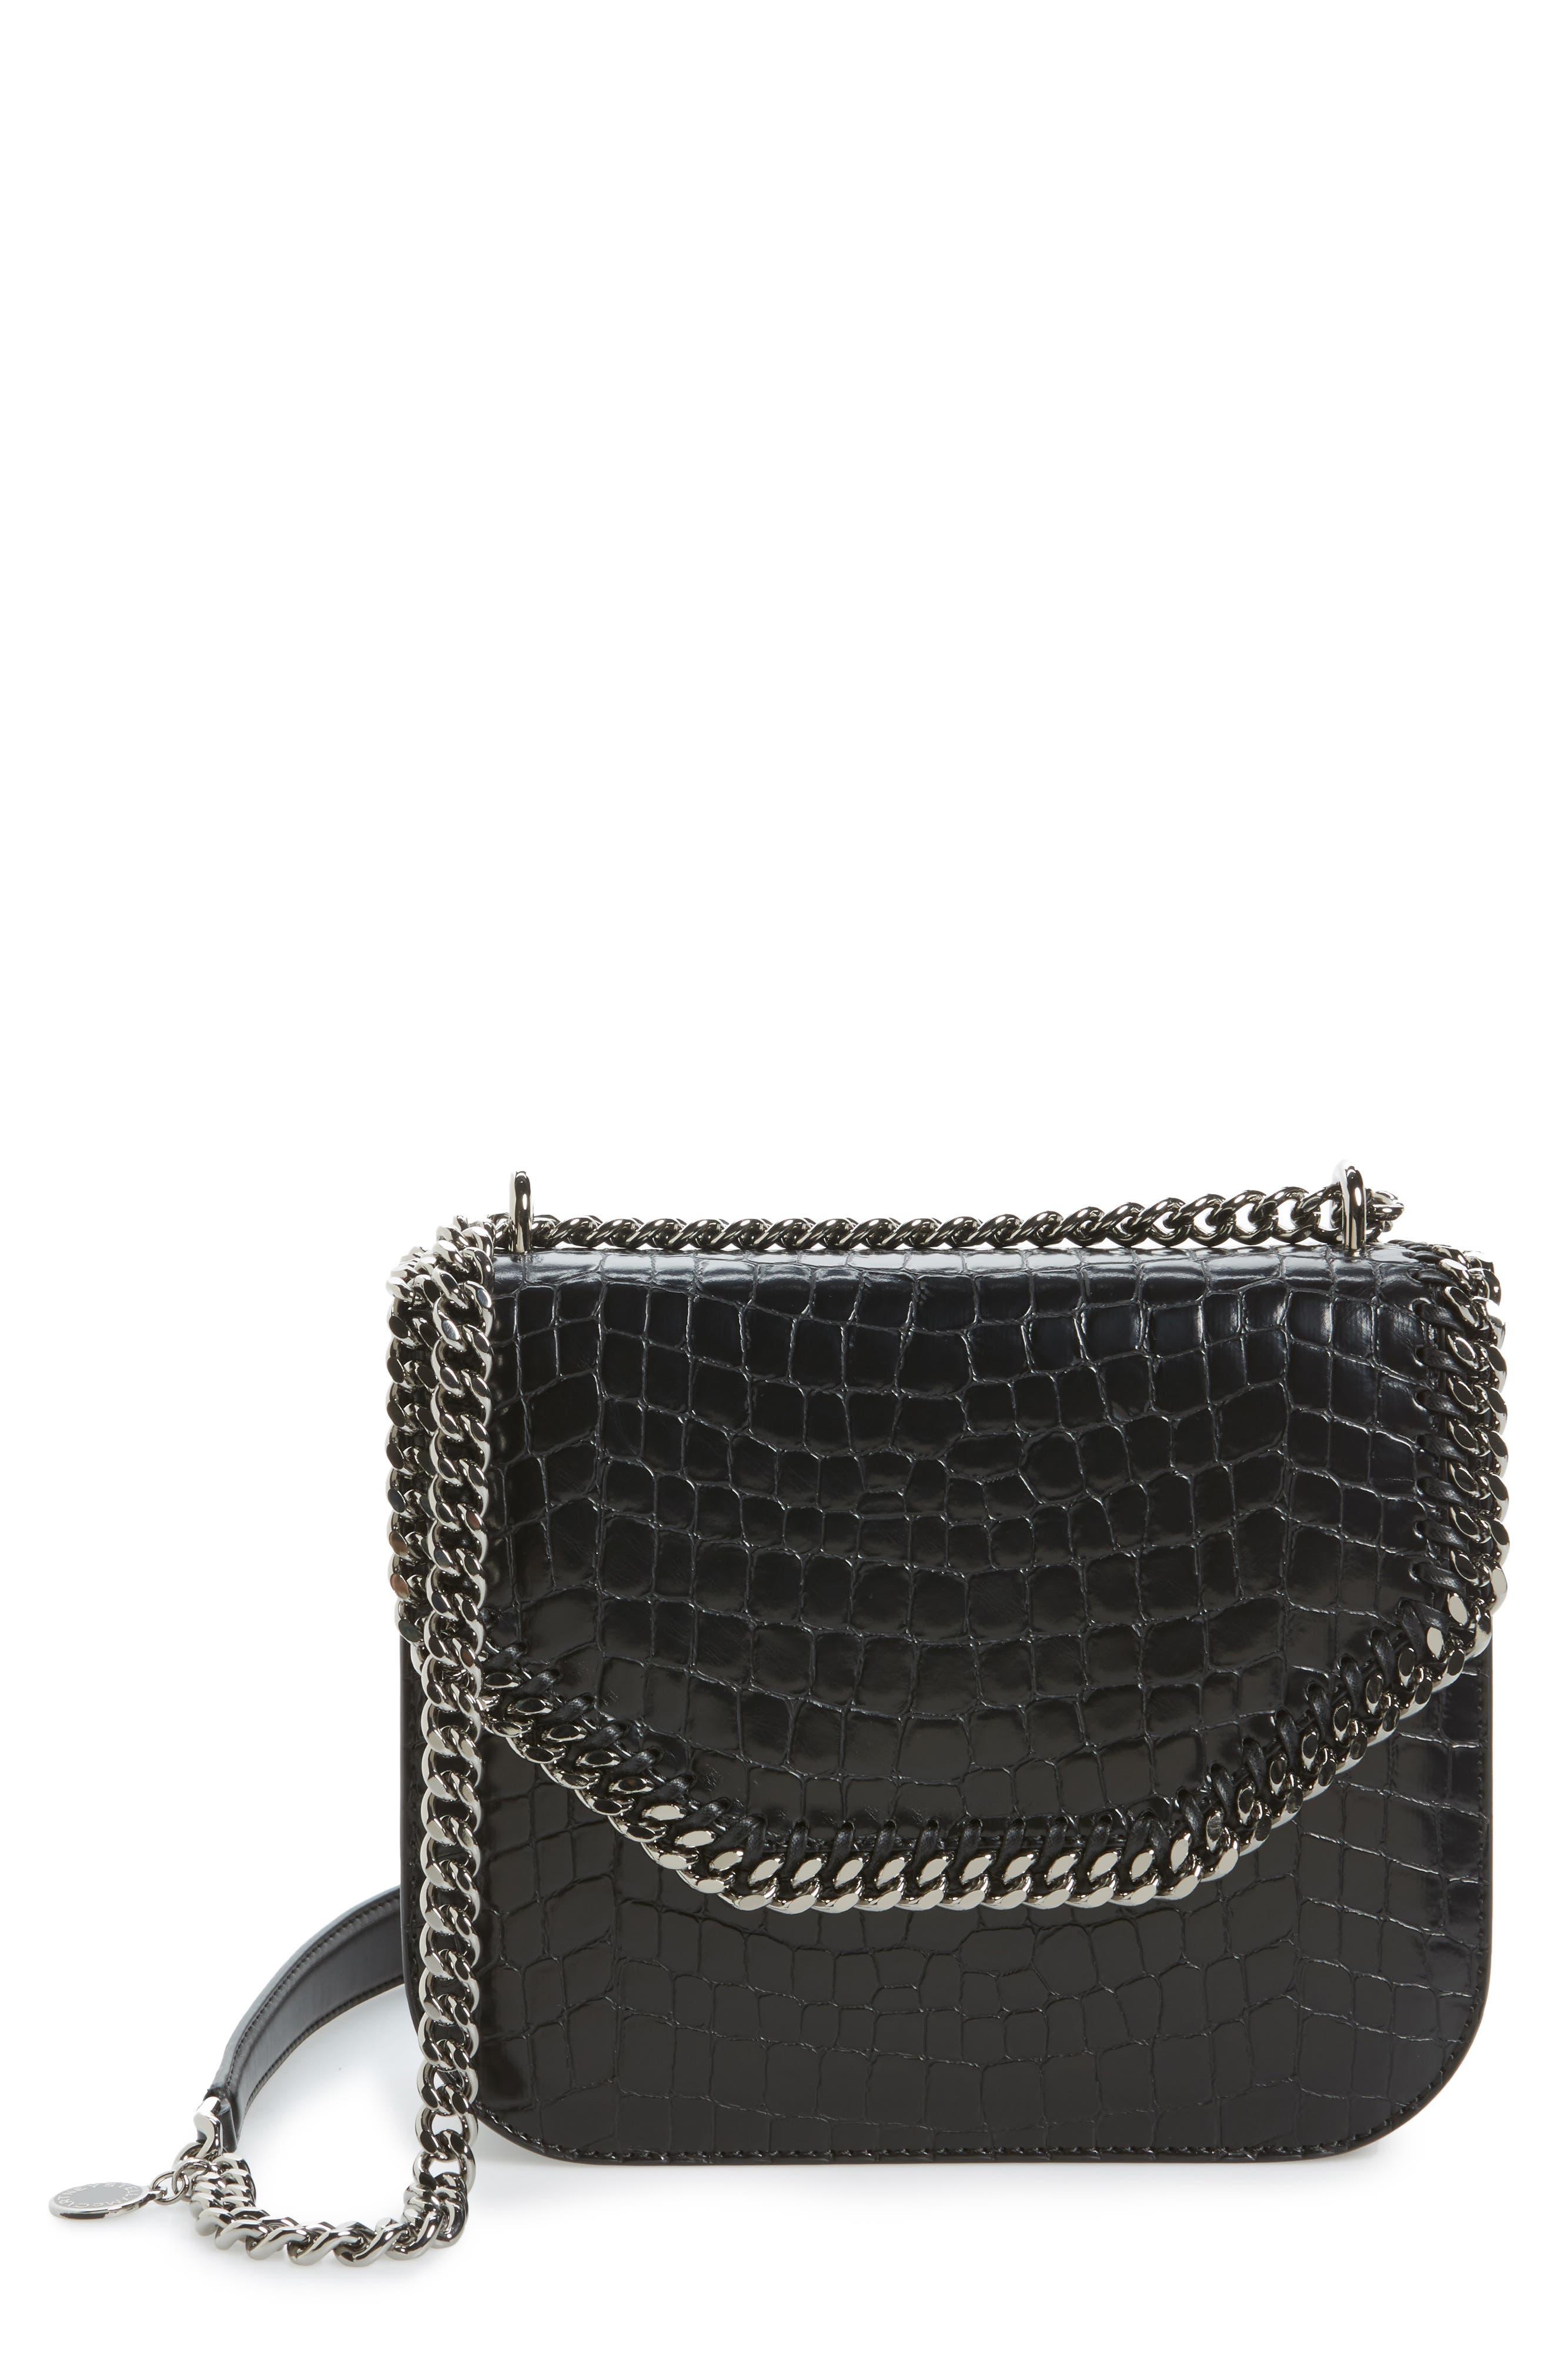 Stella McCartney Falabella Box Faux Leather Shoulder Bag